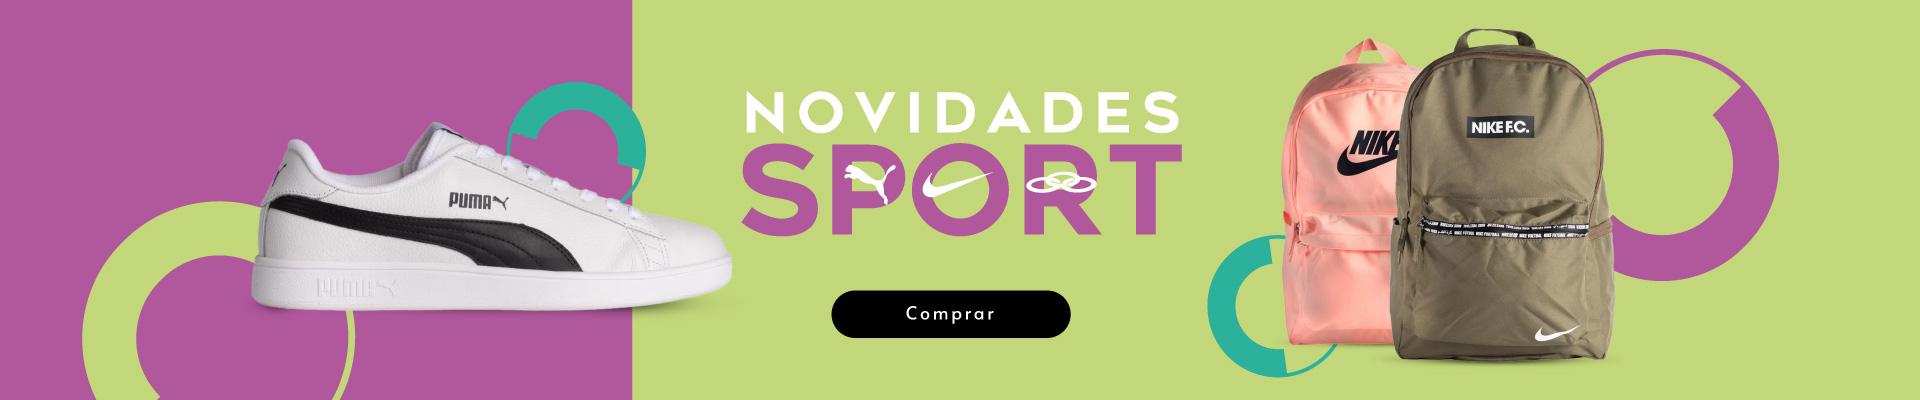 novidades esportes